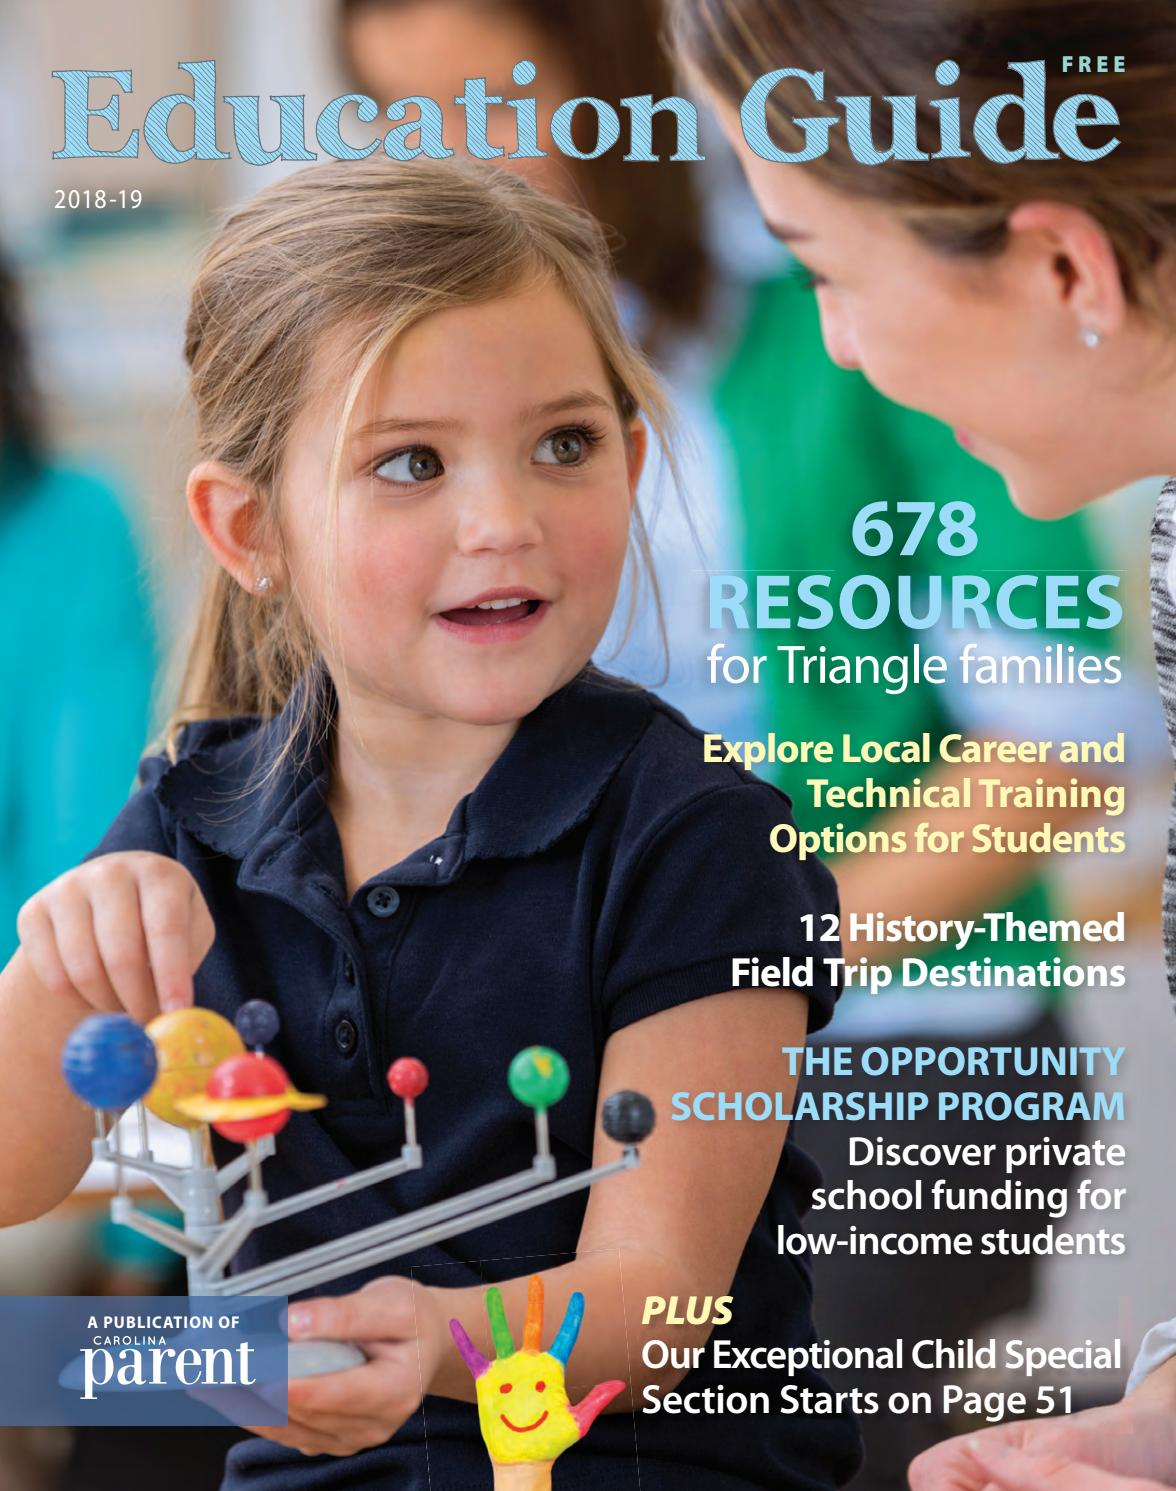 Carolina Parent Education Guide 2018-2019 by Morris Media